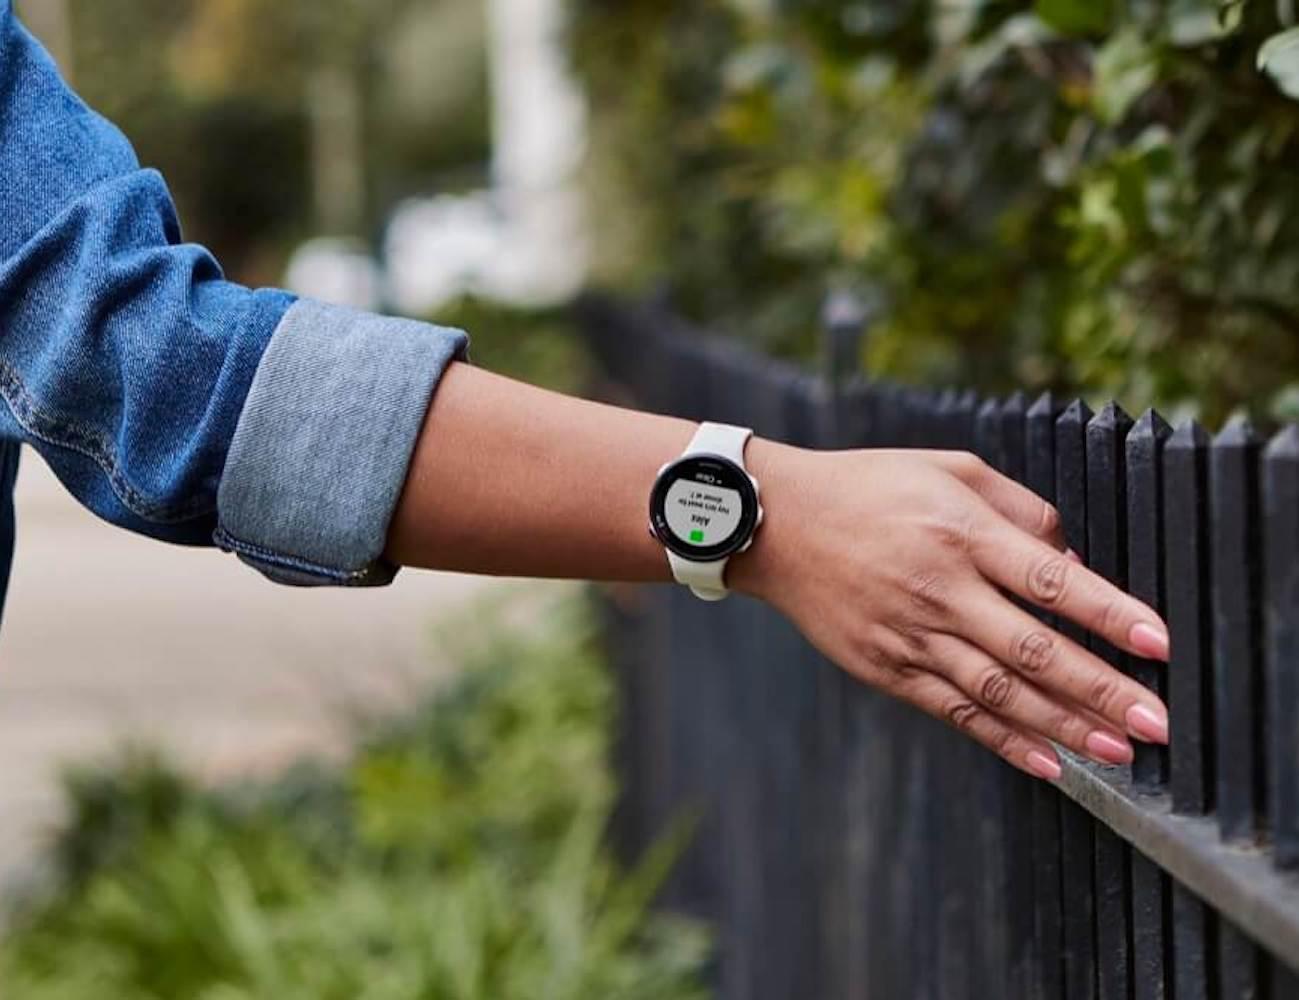 Garmin Forerunner 45 GPS Running Watch tracks your exercise activity